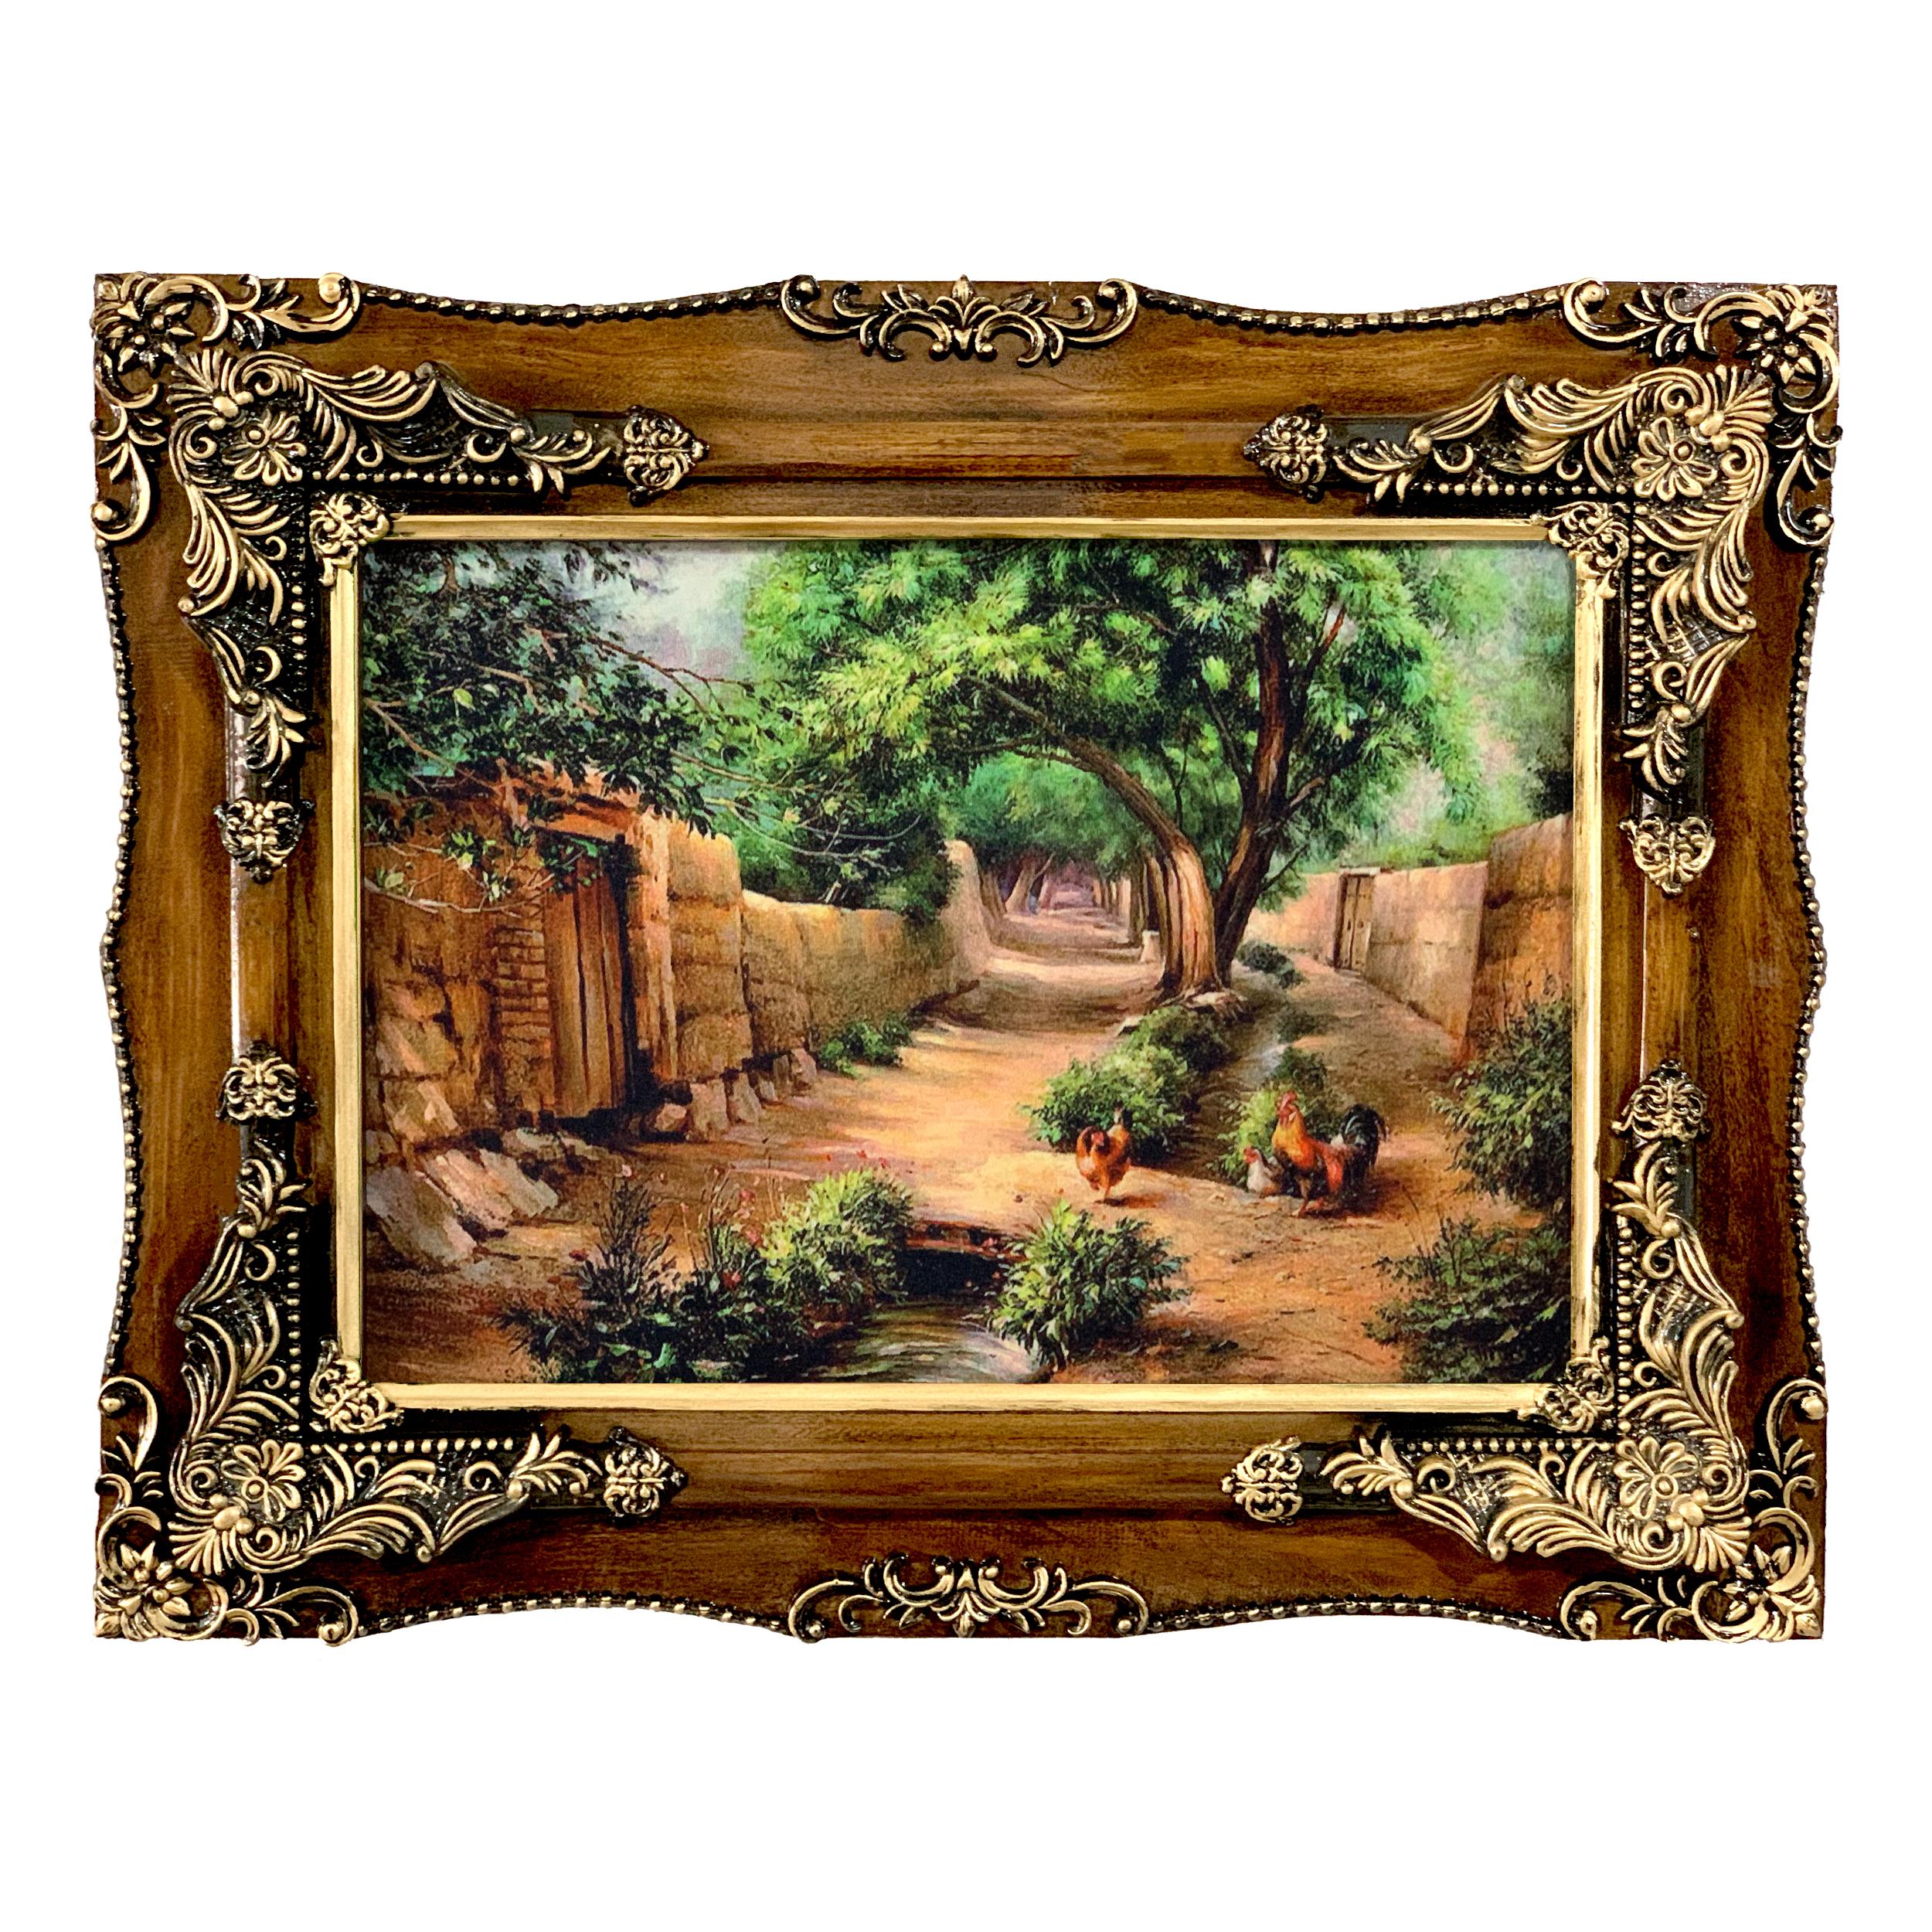 تابلو فرش ماشینی طرح کوچه باغ کد ۷۰۹۷